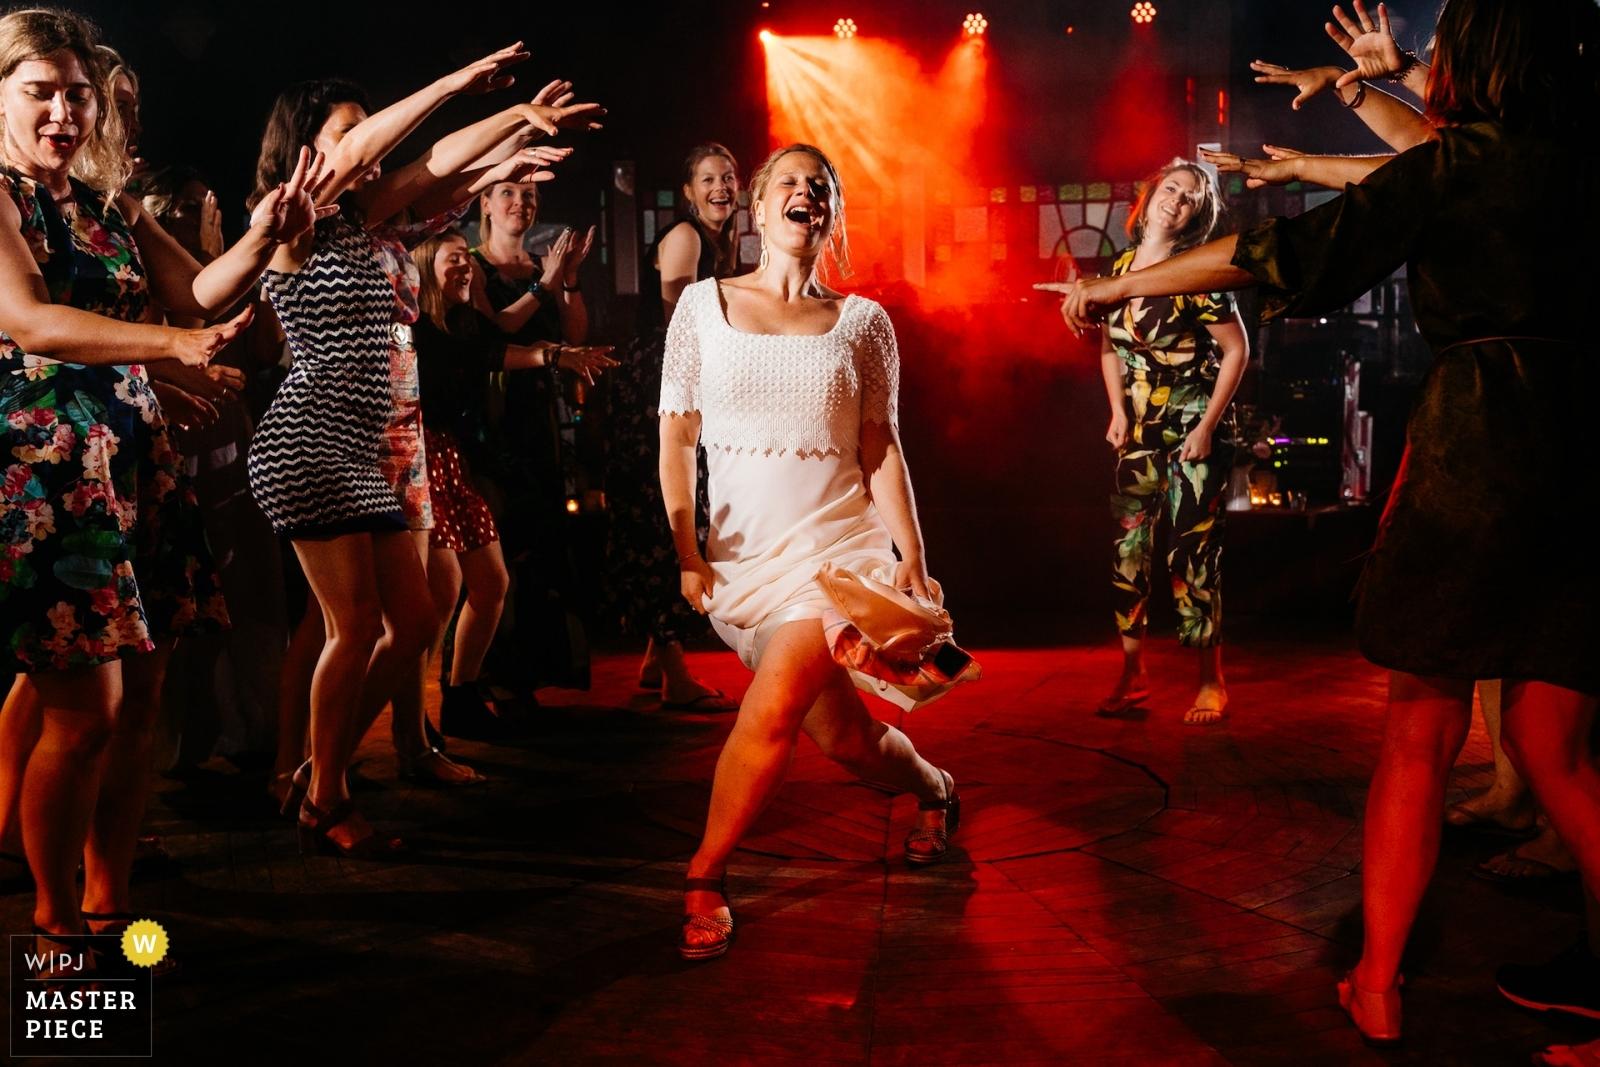 Bride dancing with her friends - Utrecht, Netherlands Wedding Photography -  | Party venue